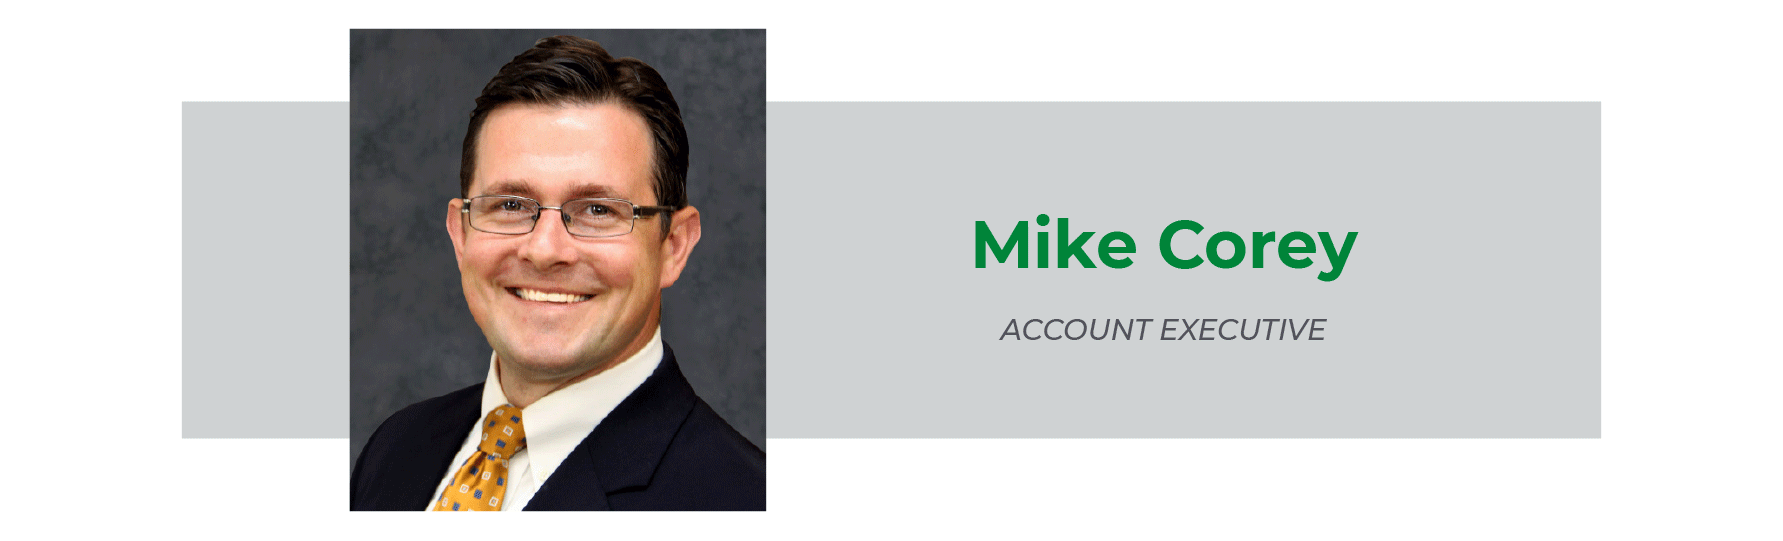 Mike Corey Account Exec.